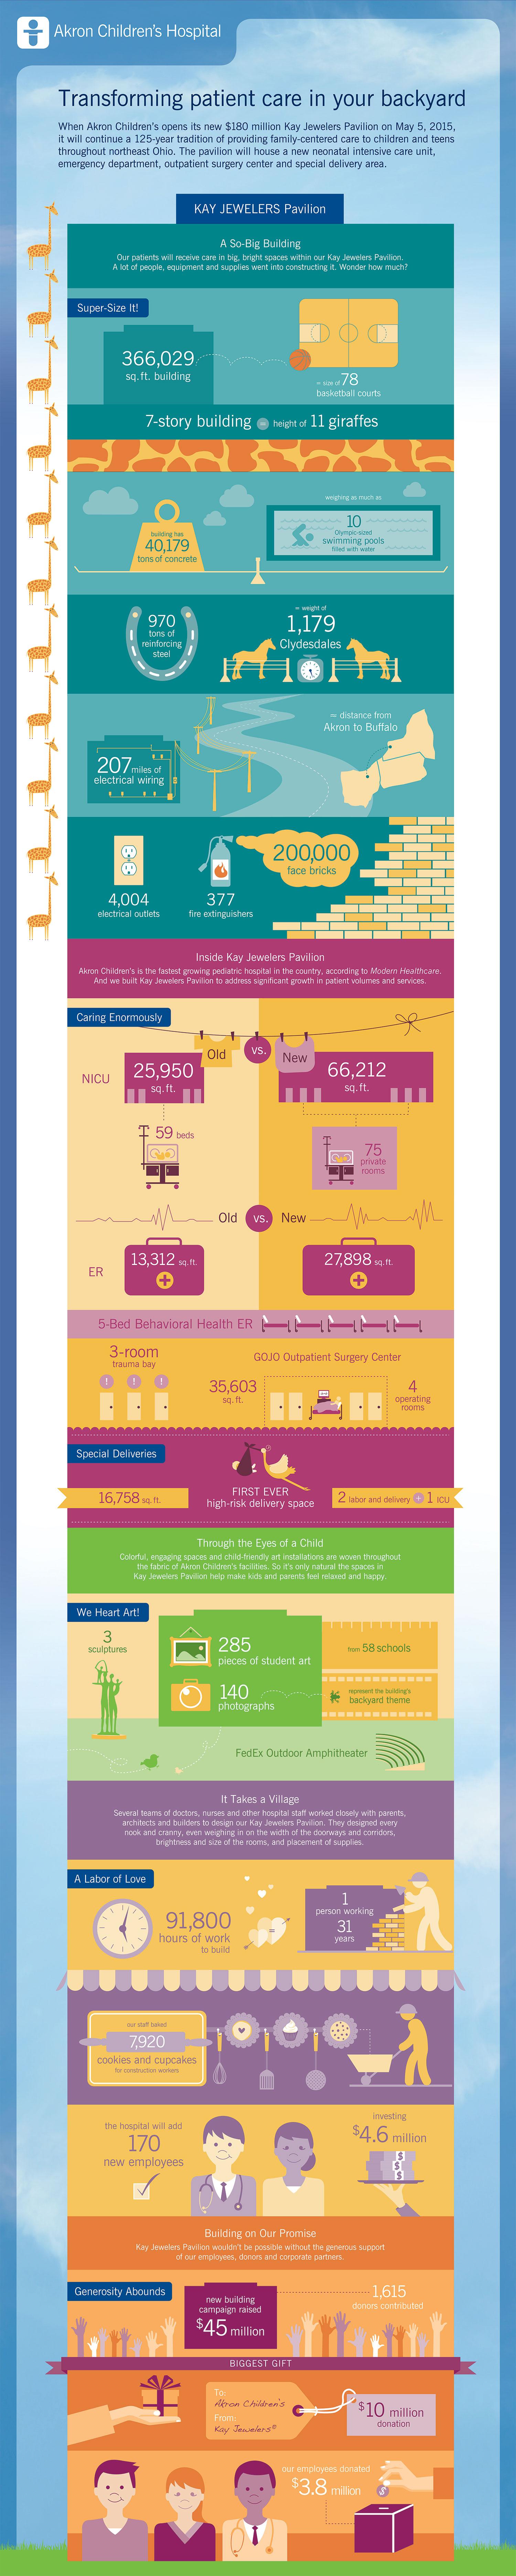 Kay Jewelers Pavilion infographic